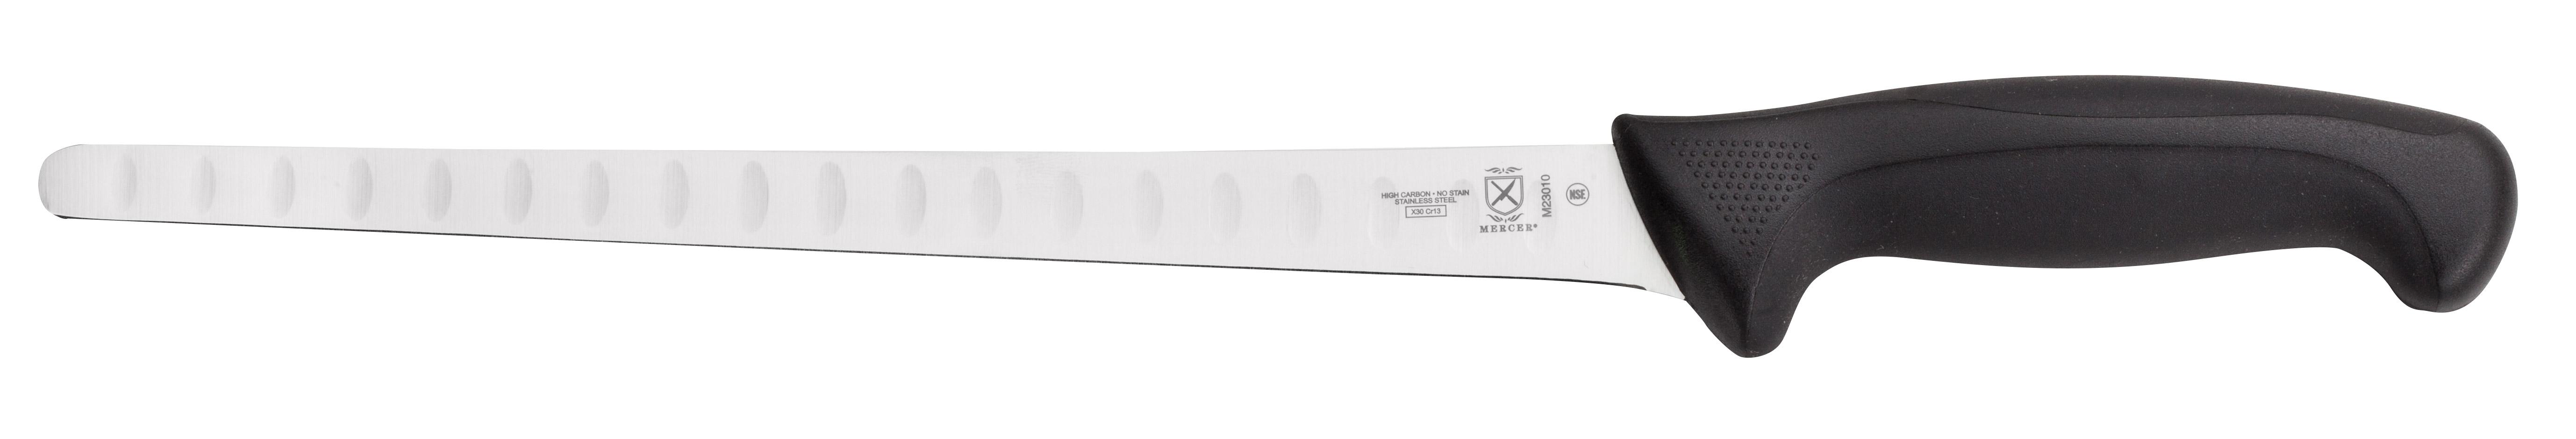 Mercer Culinary M23010 knife, slicer